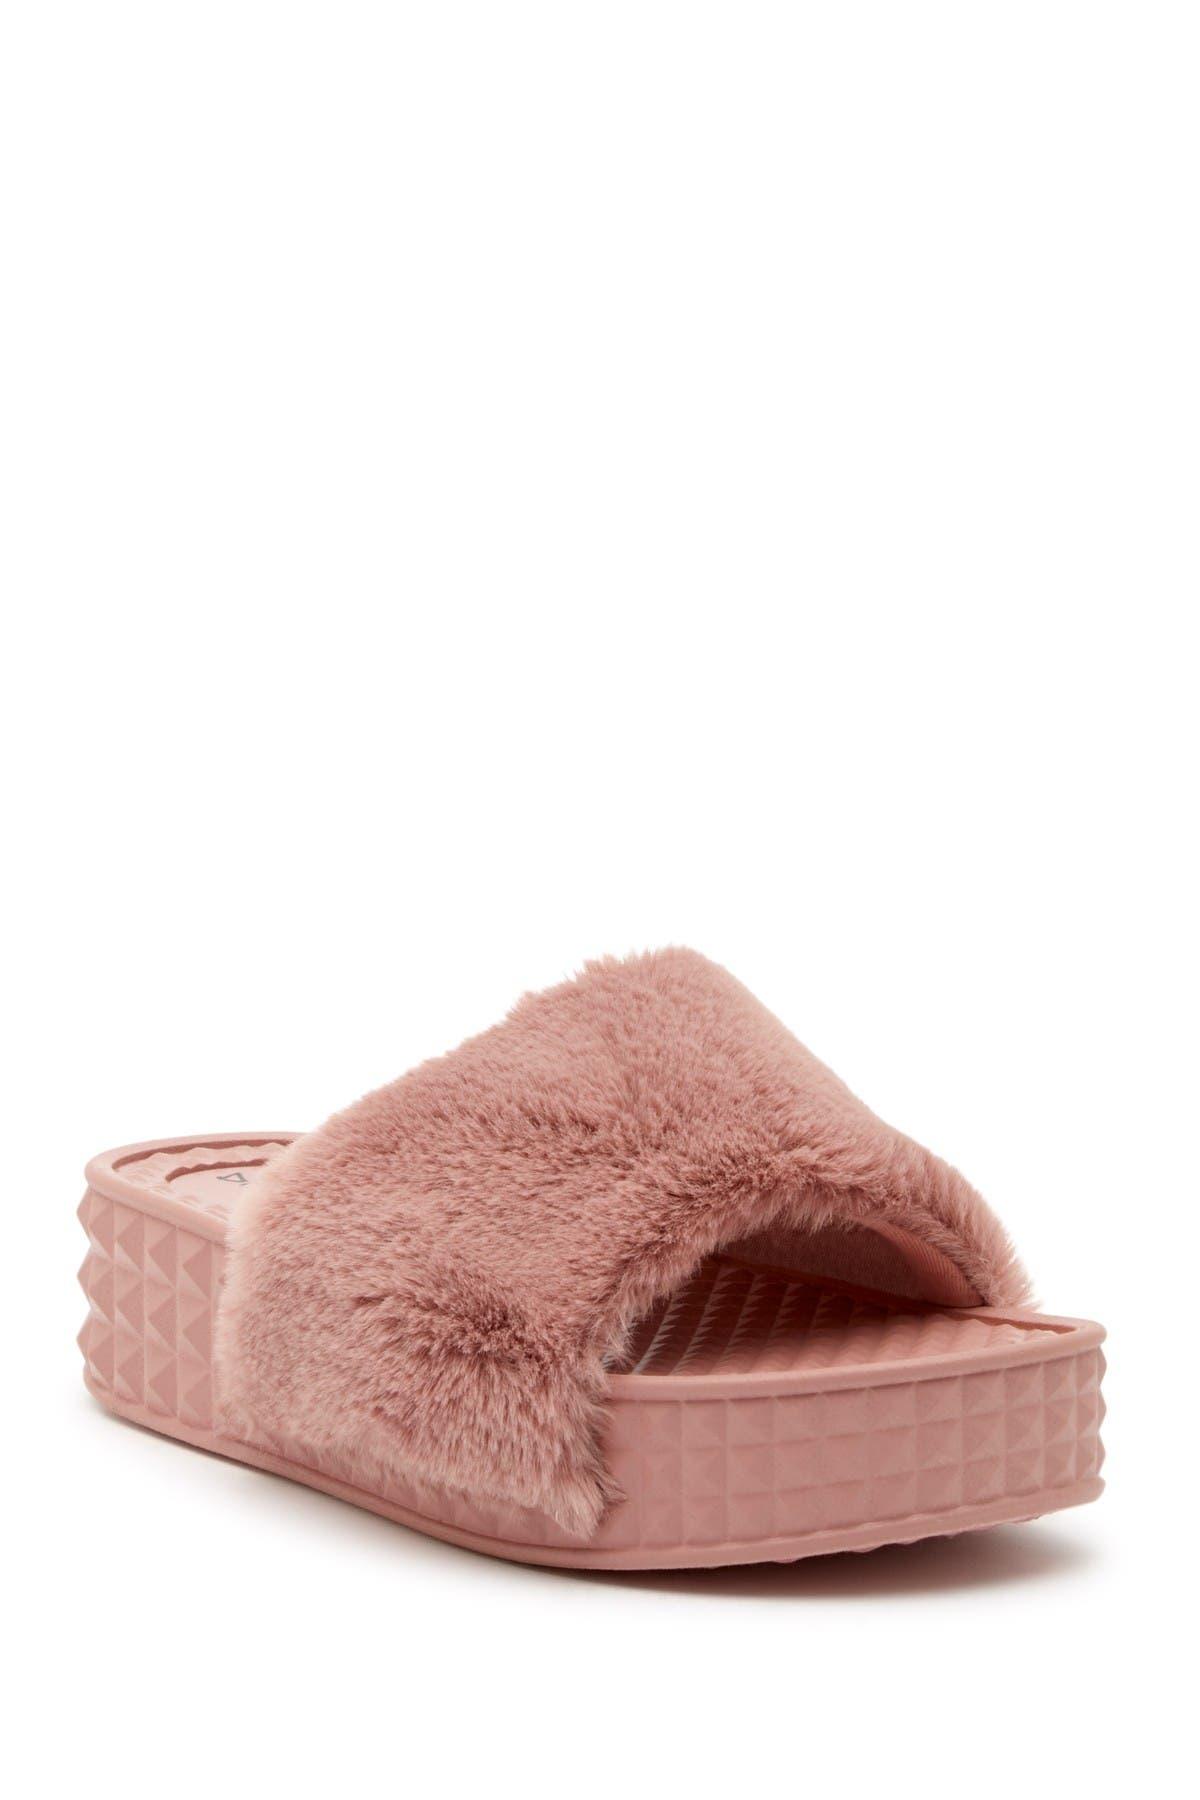 Image of Dirty Laundry Sonny Faux Fur Slide Sandal